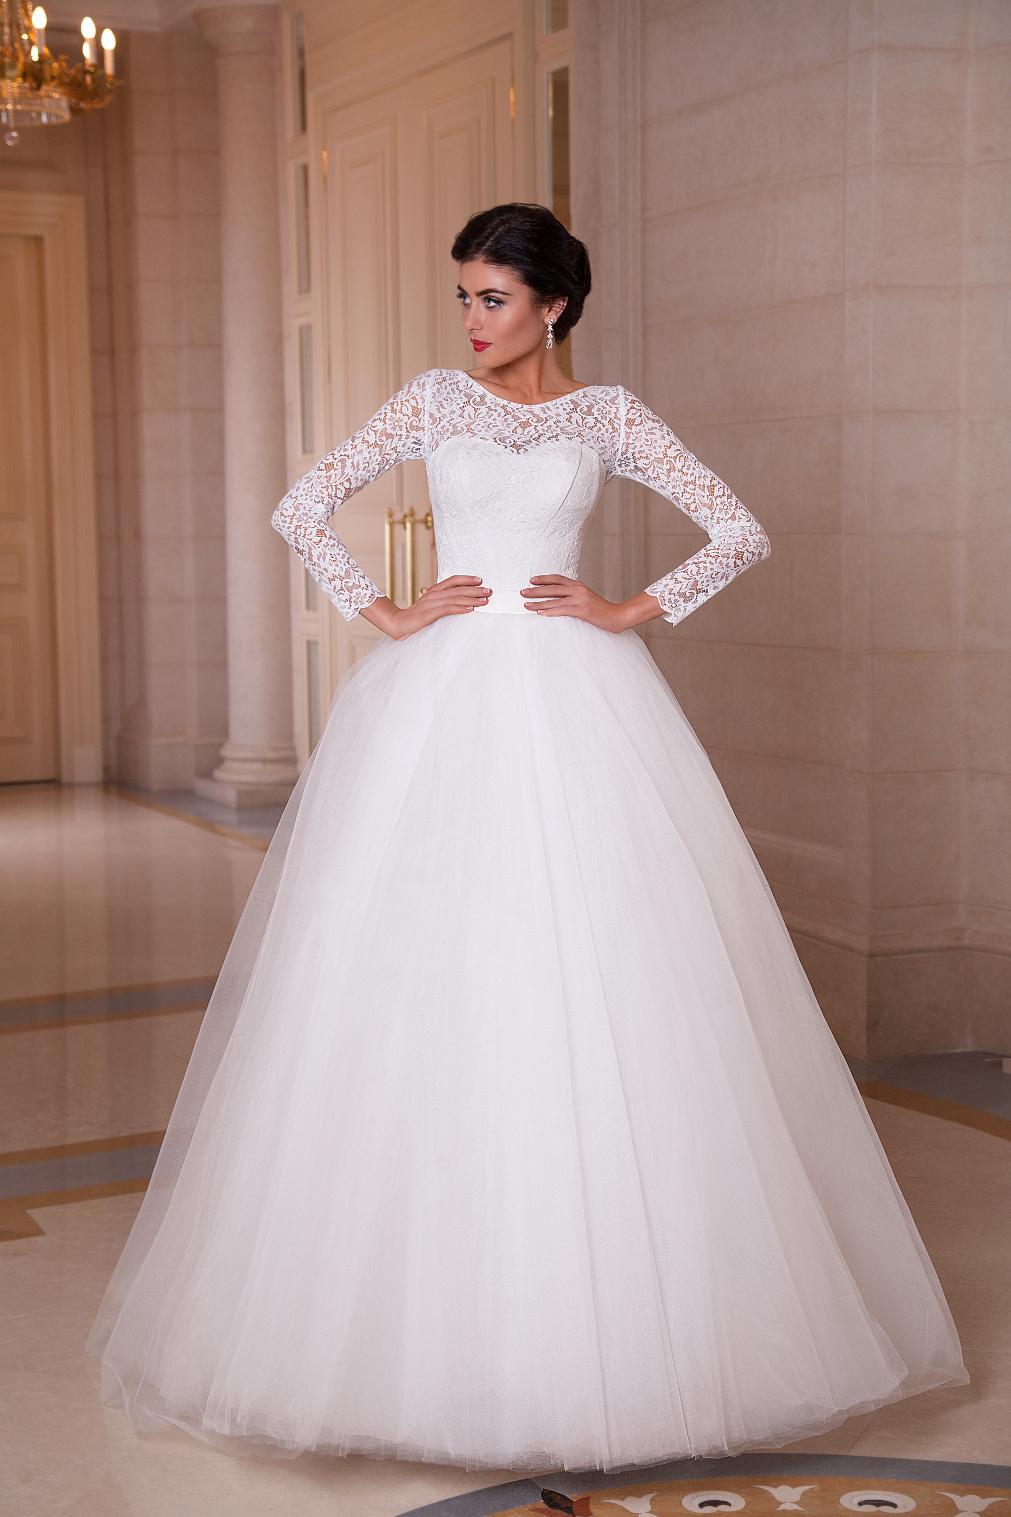 بالصور صور فساتين عروس , اجمل واحدث صور لفساتين العروس 2378 4